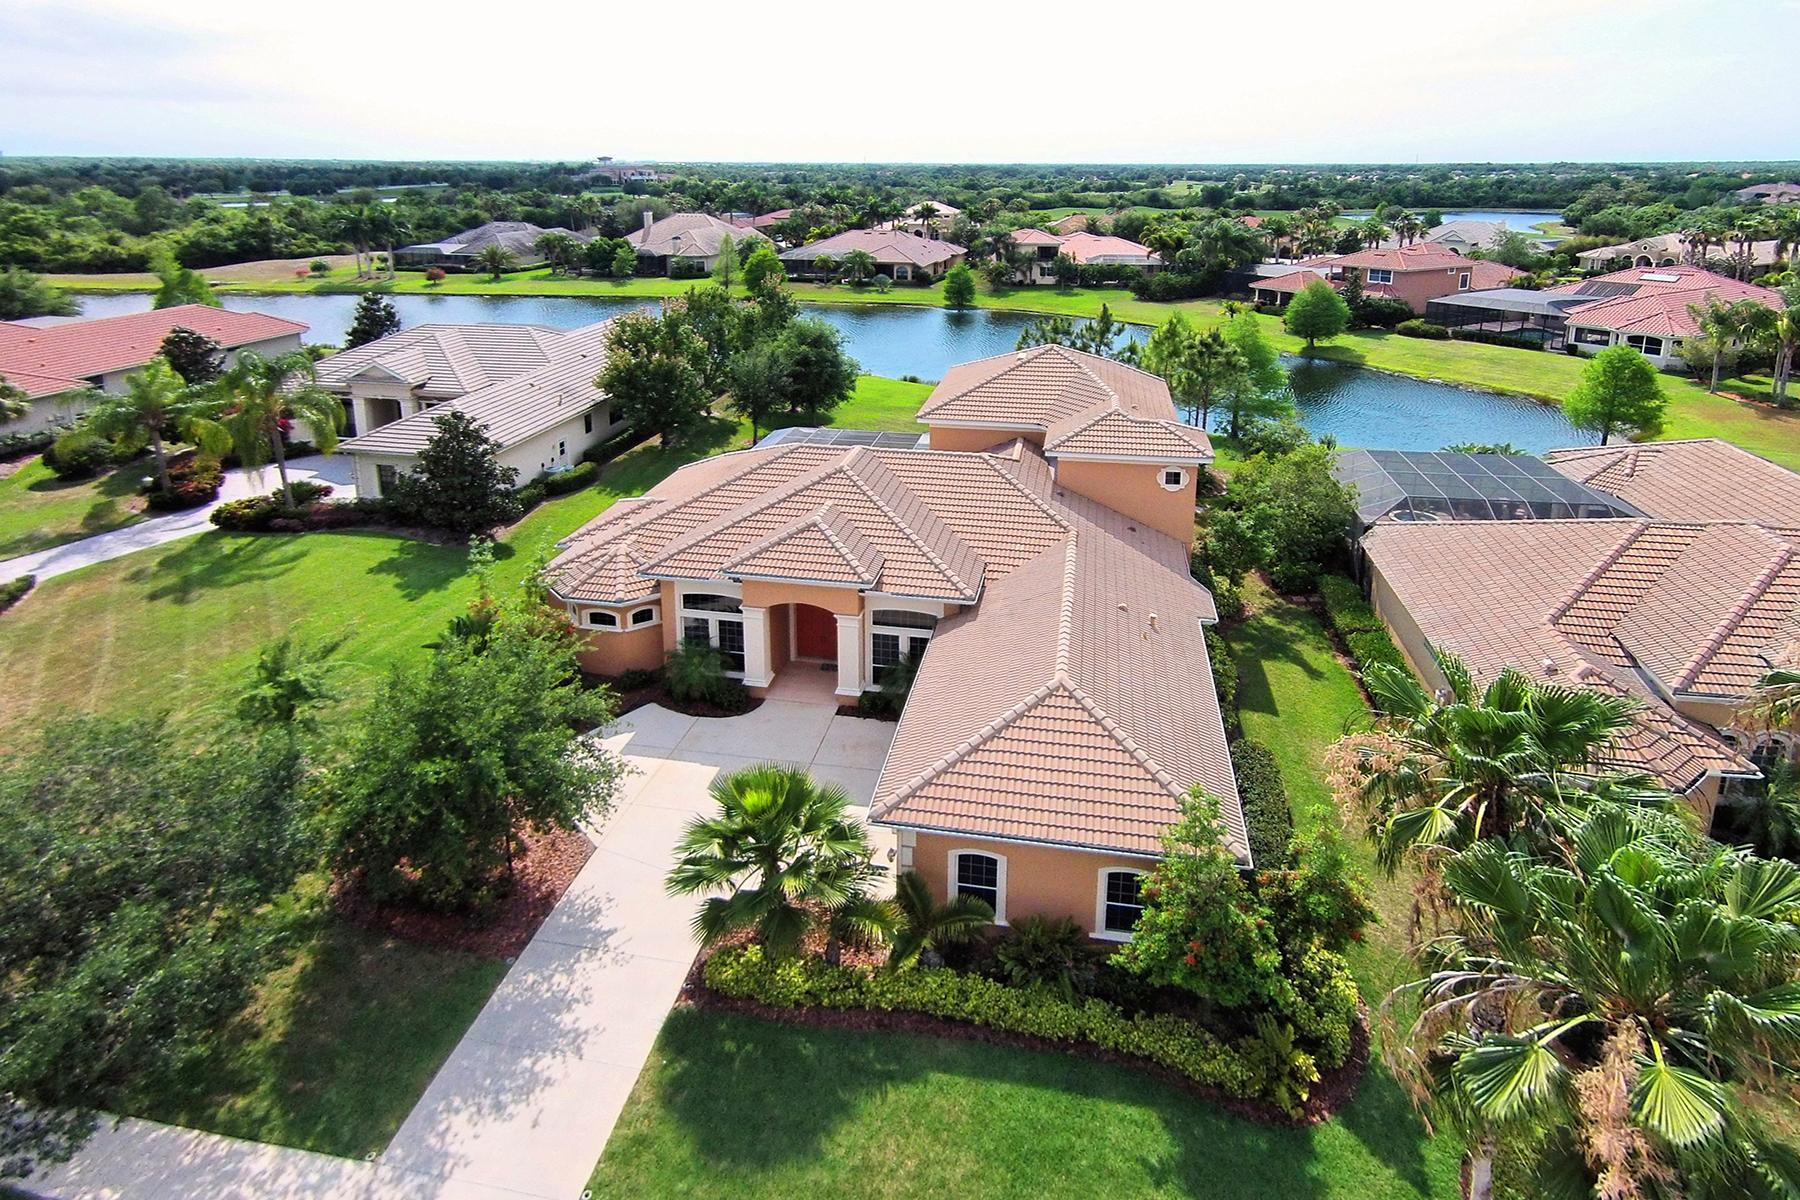 Casa para uma família para Venda às LAKEWOOD RANCH COUNTRY CLUB 7524 Rigby Ct Lakewood Ranch, Florida 34202 Estados Unidos